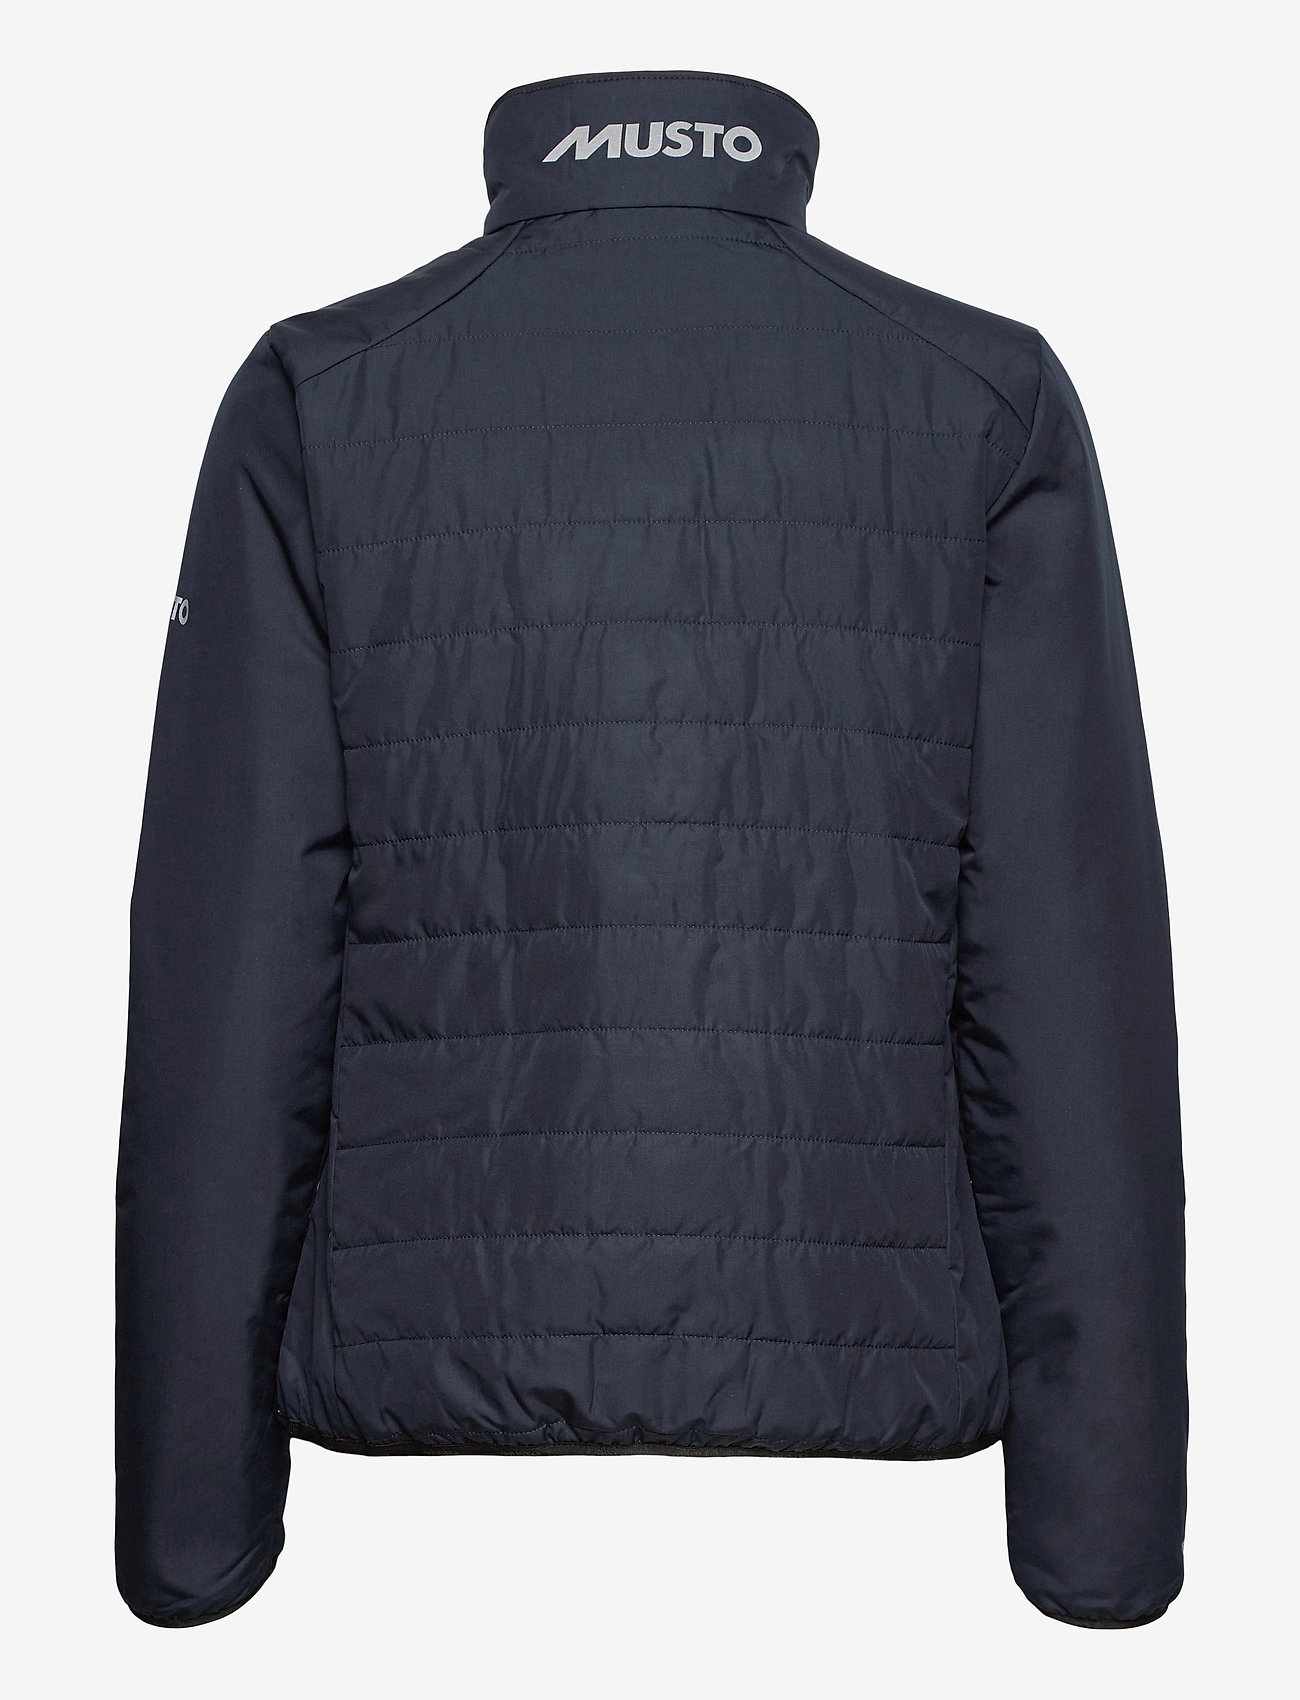 Musto - W CORSICA PL JKT - sports jackets - 598 true navy - 1